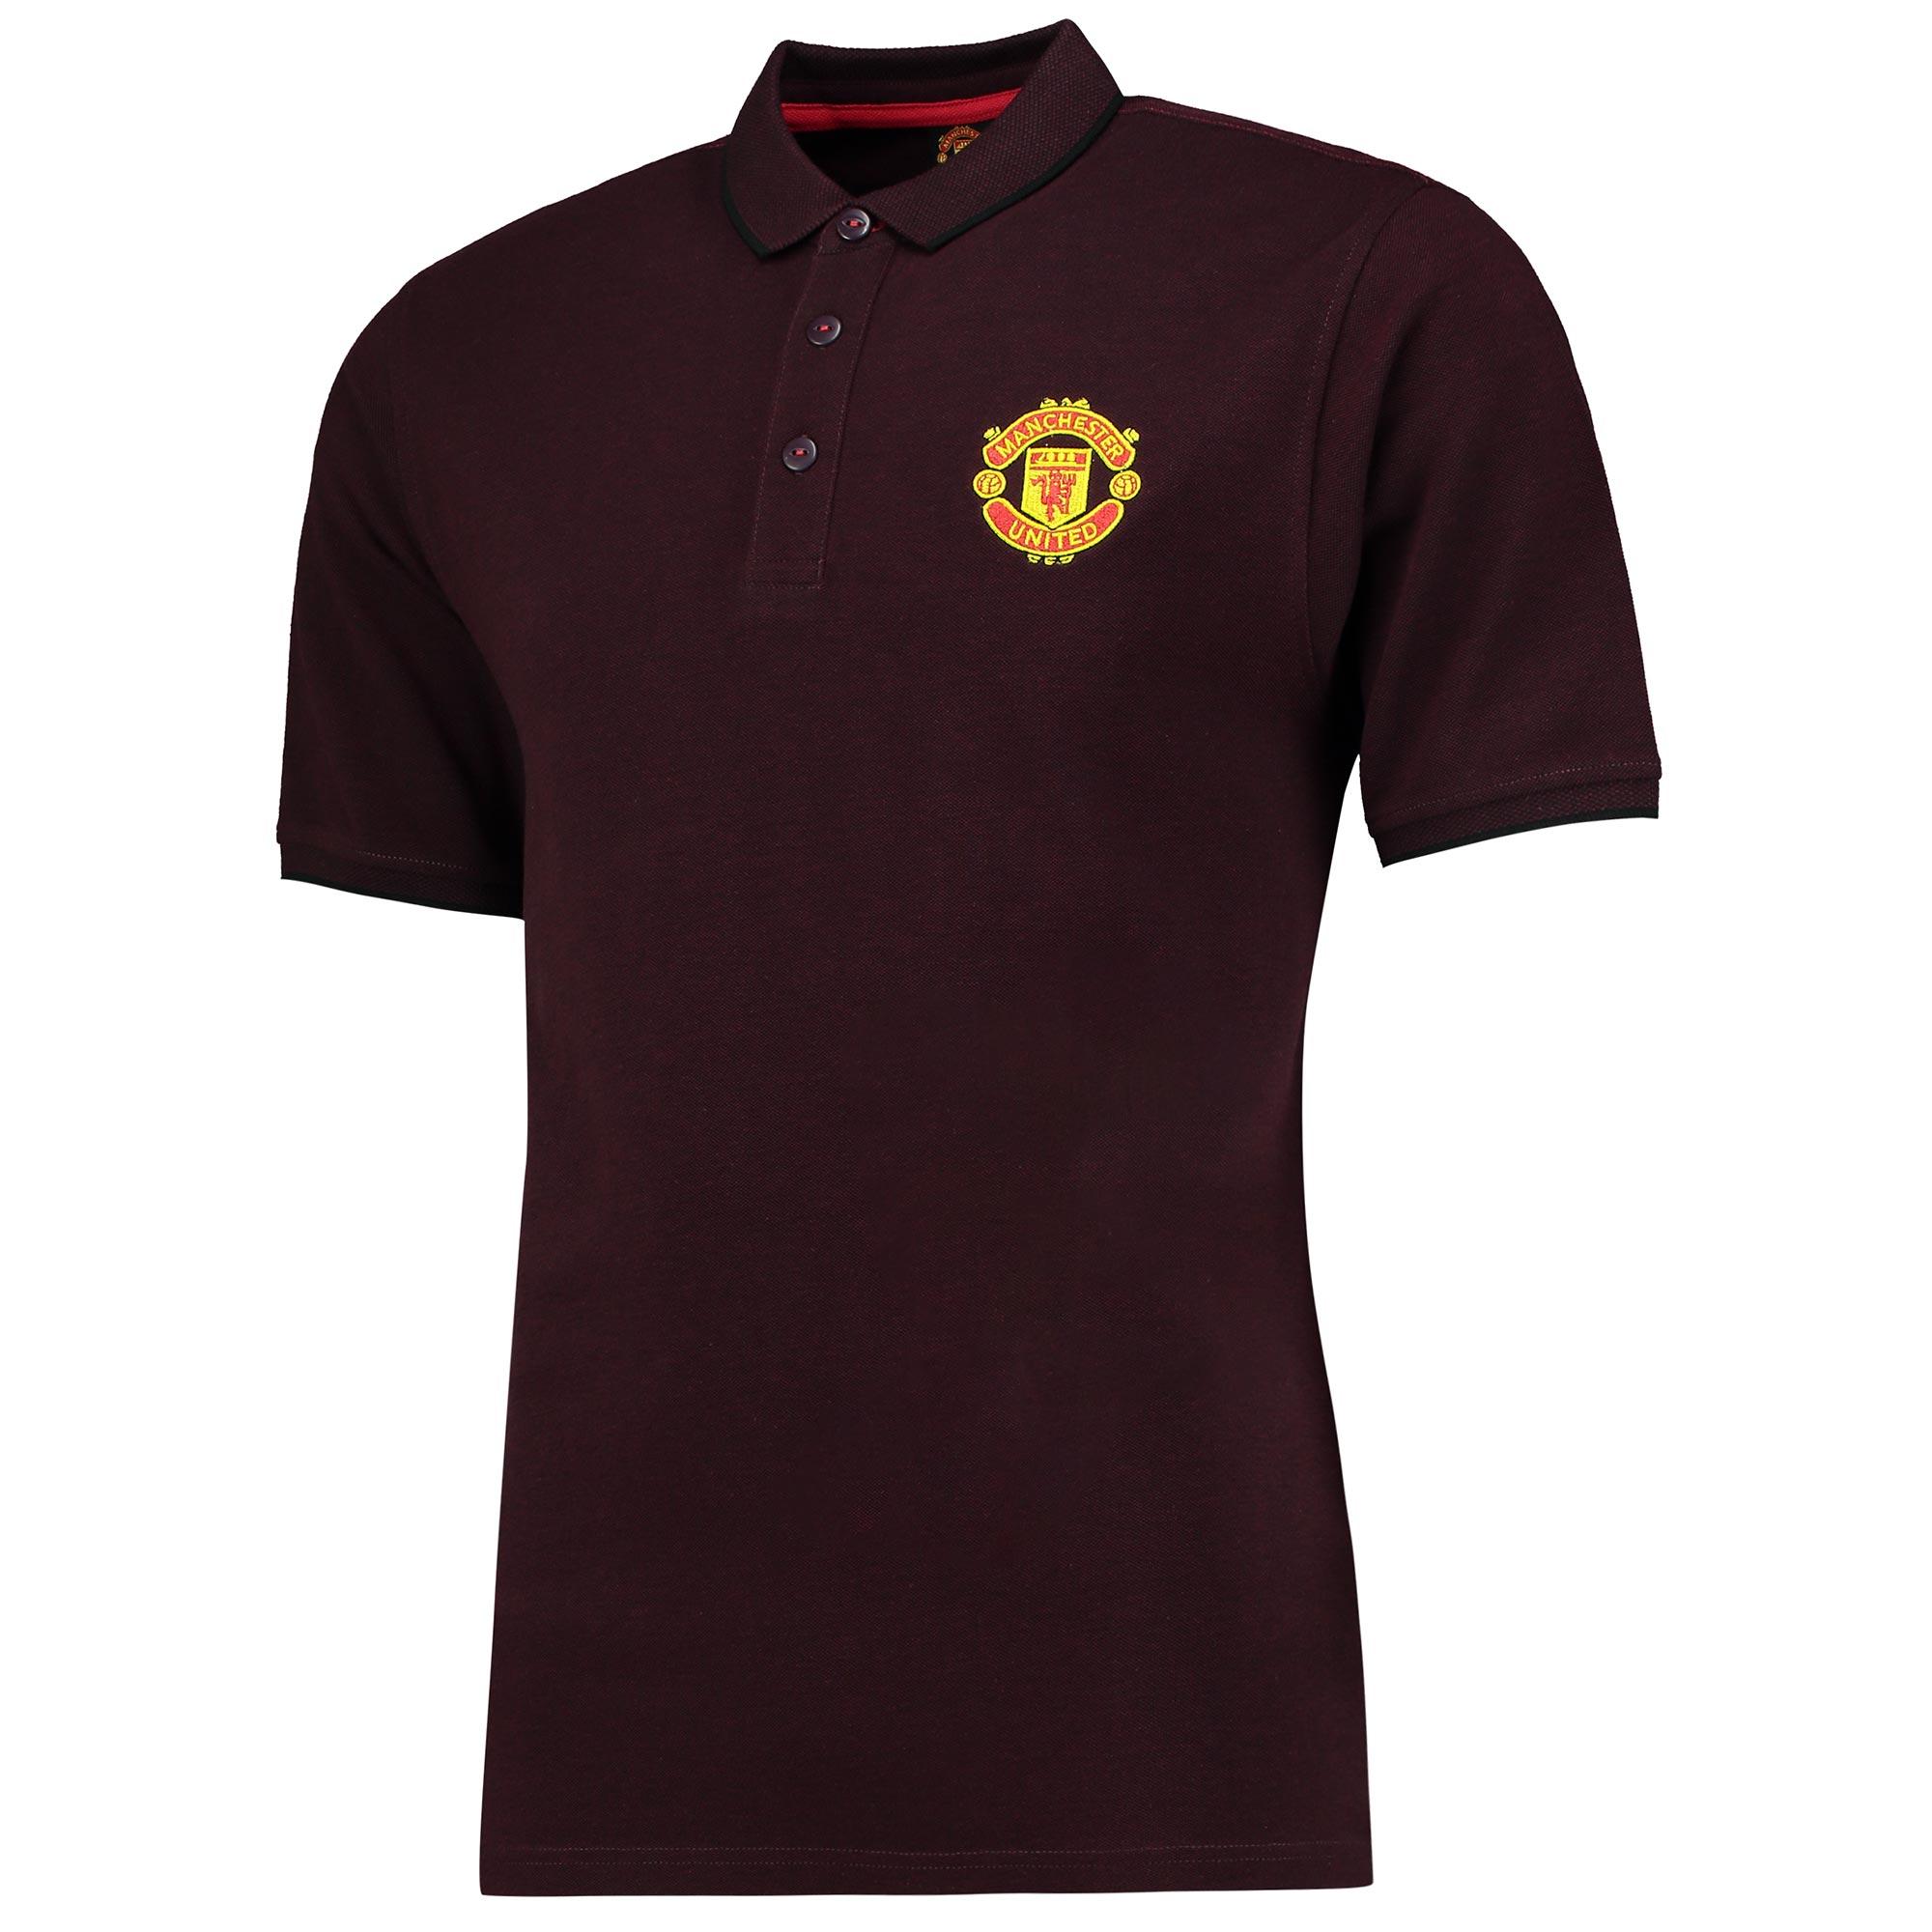 Manchester United Essential Polo Shirt - Burgundy Marl - Mens